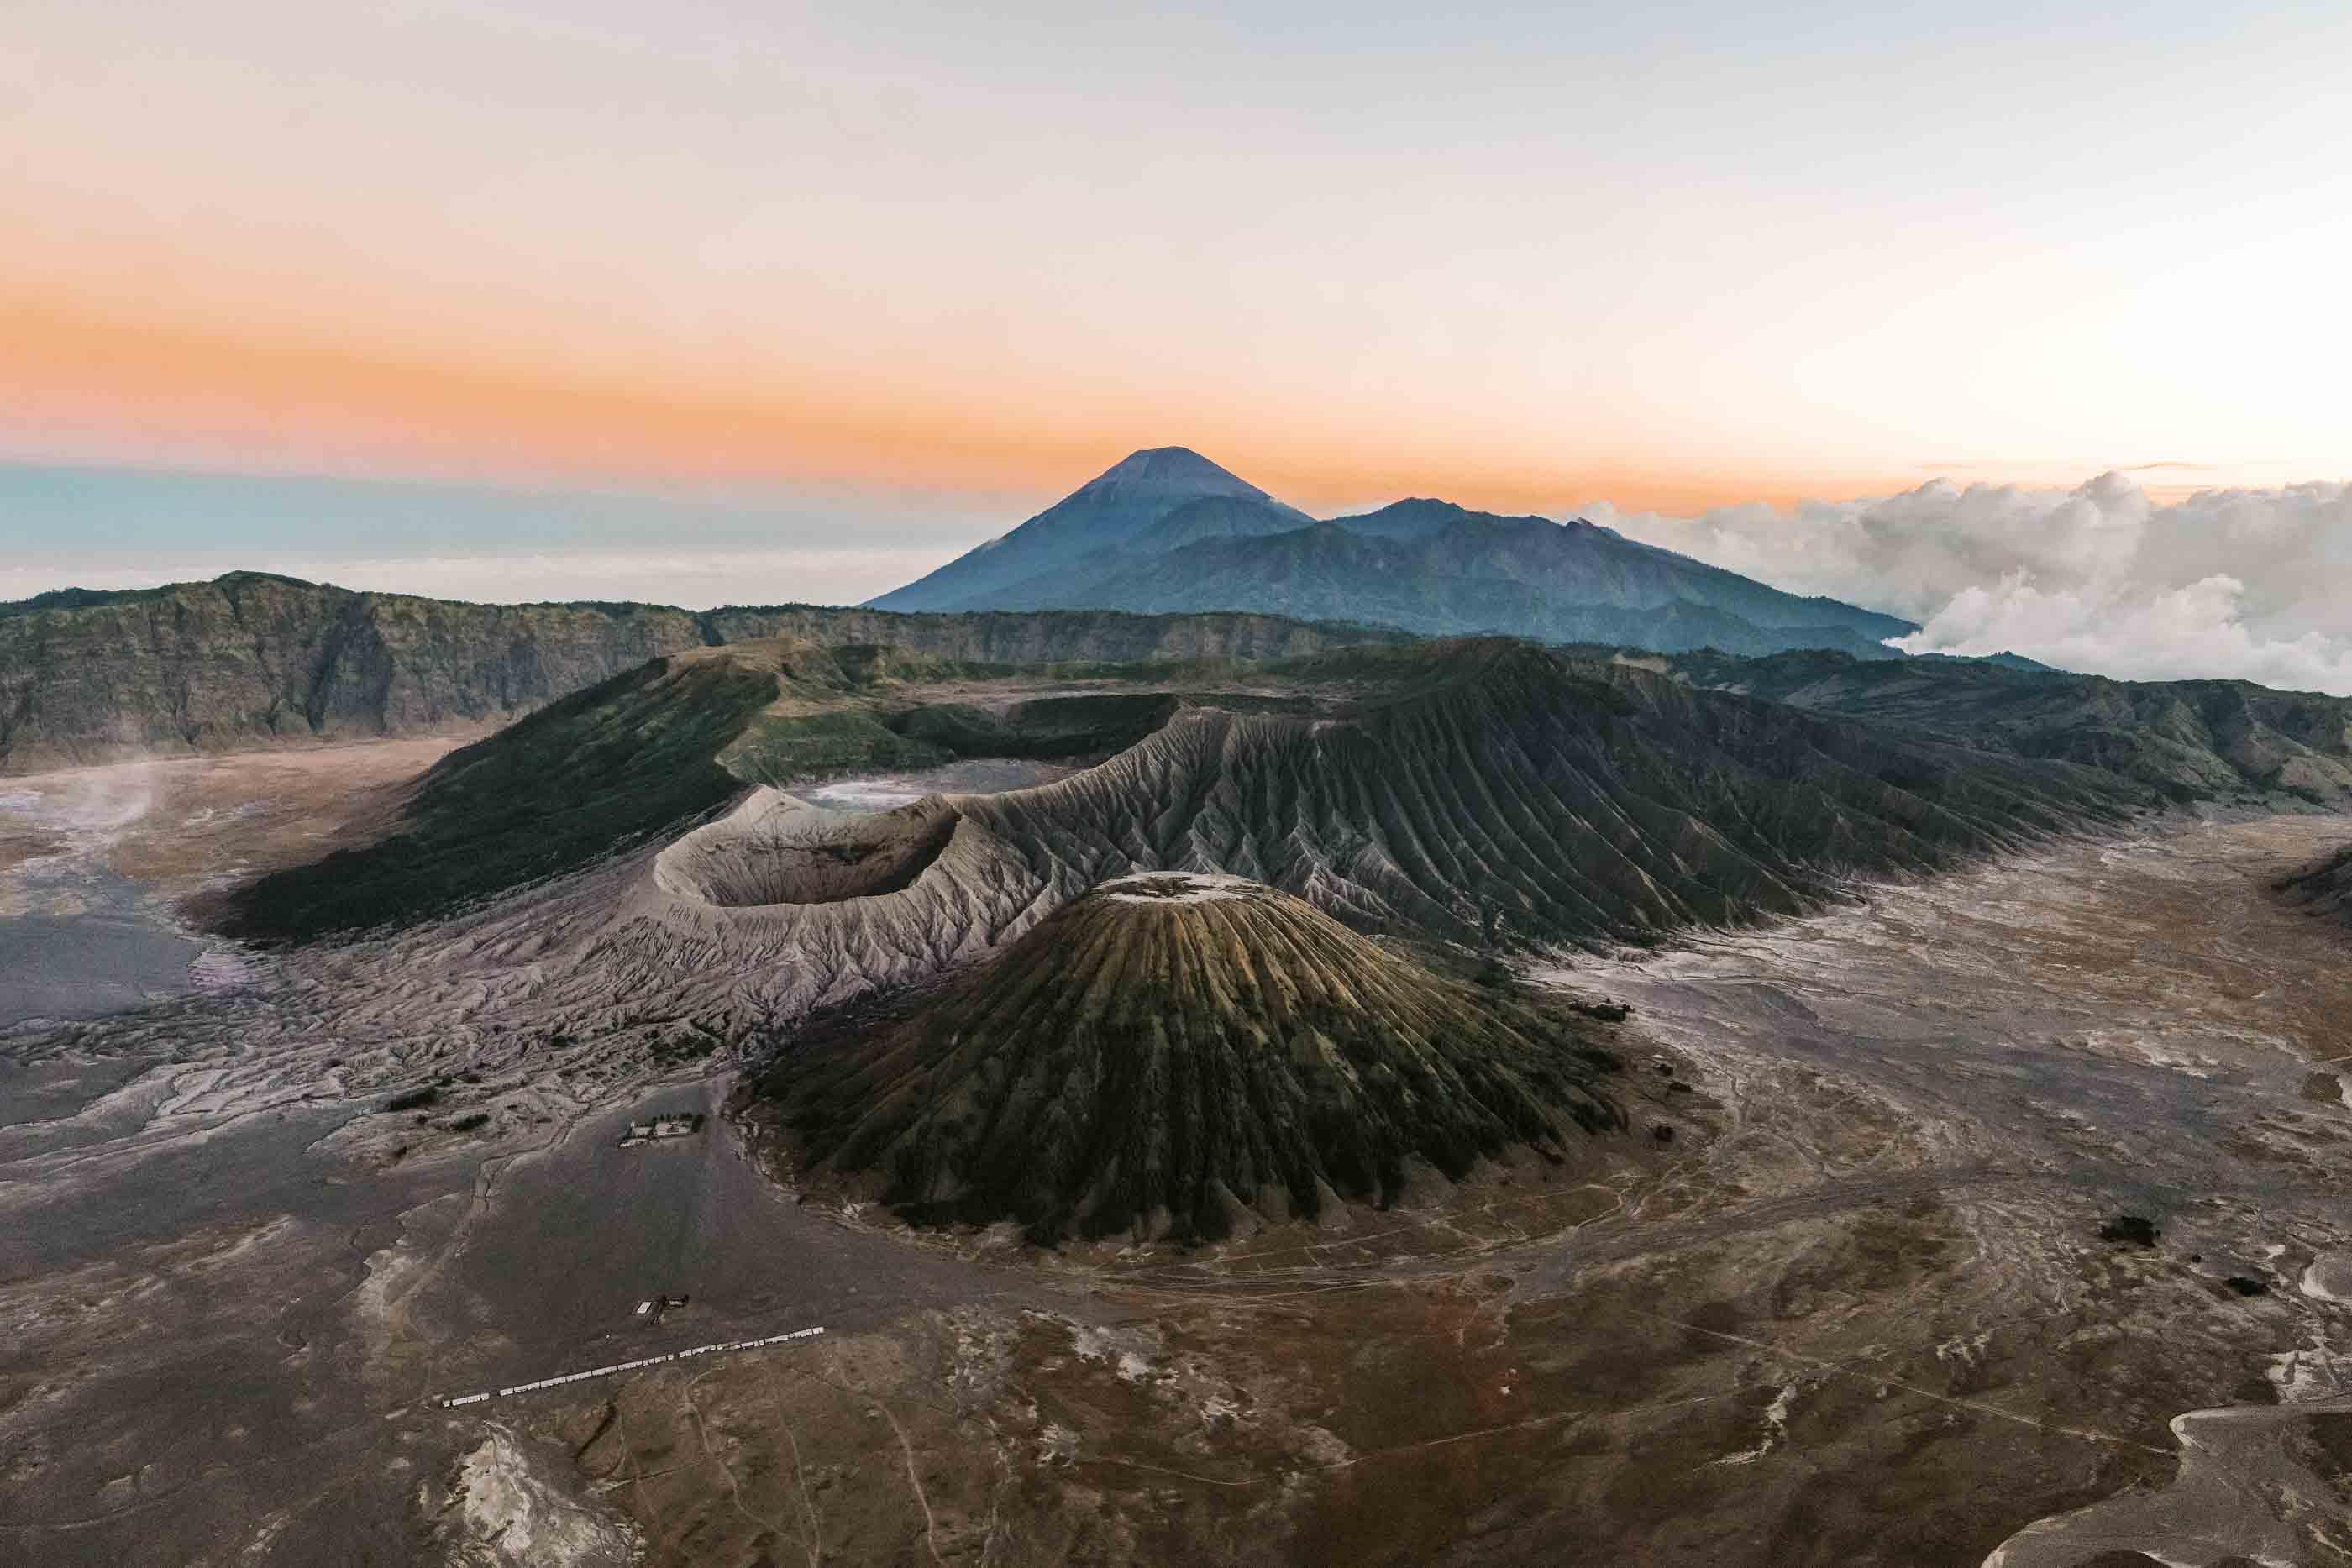 Ein Vulkan in Indonesien.